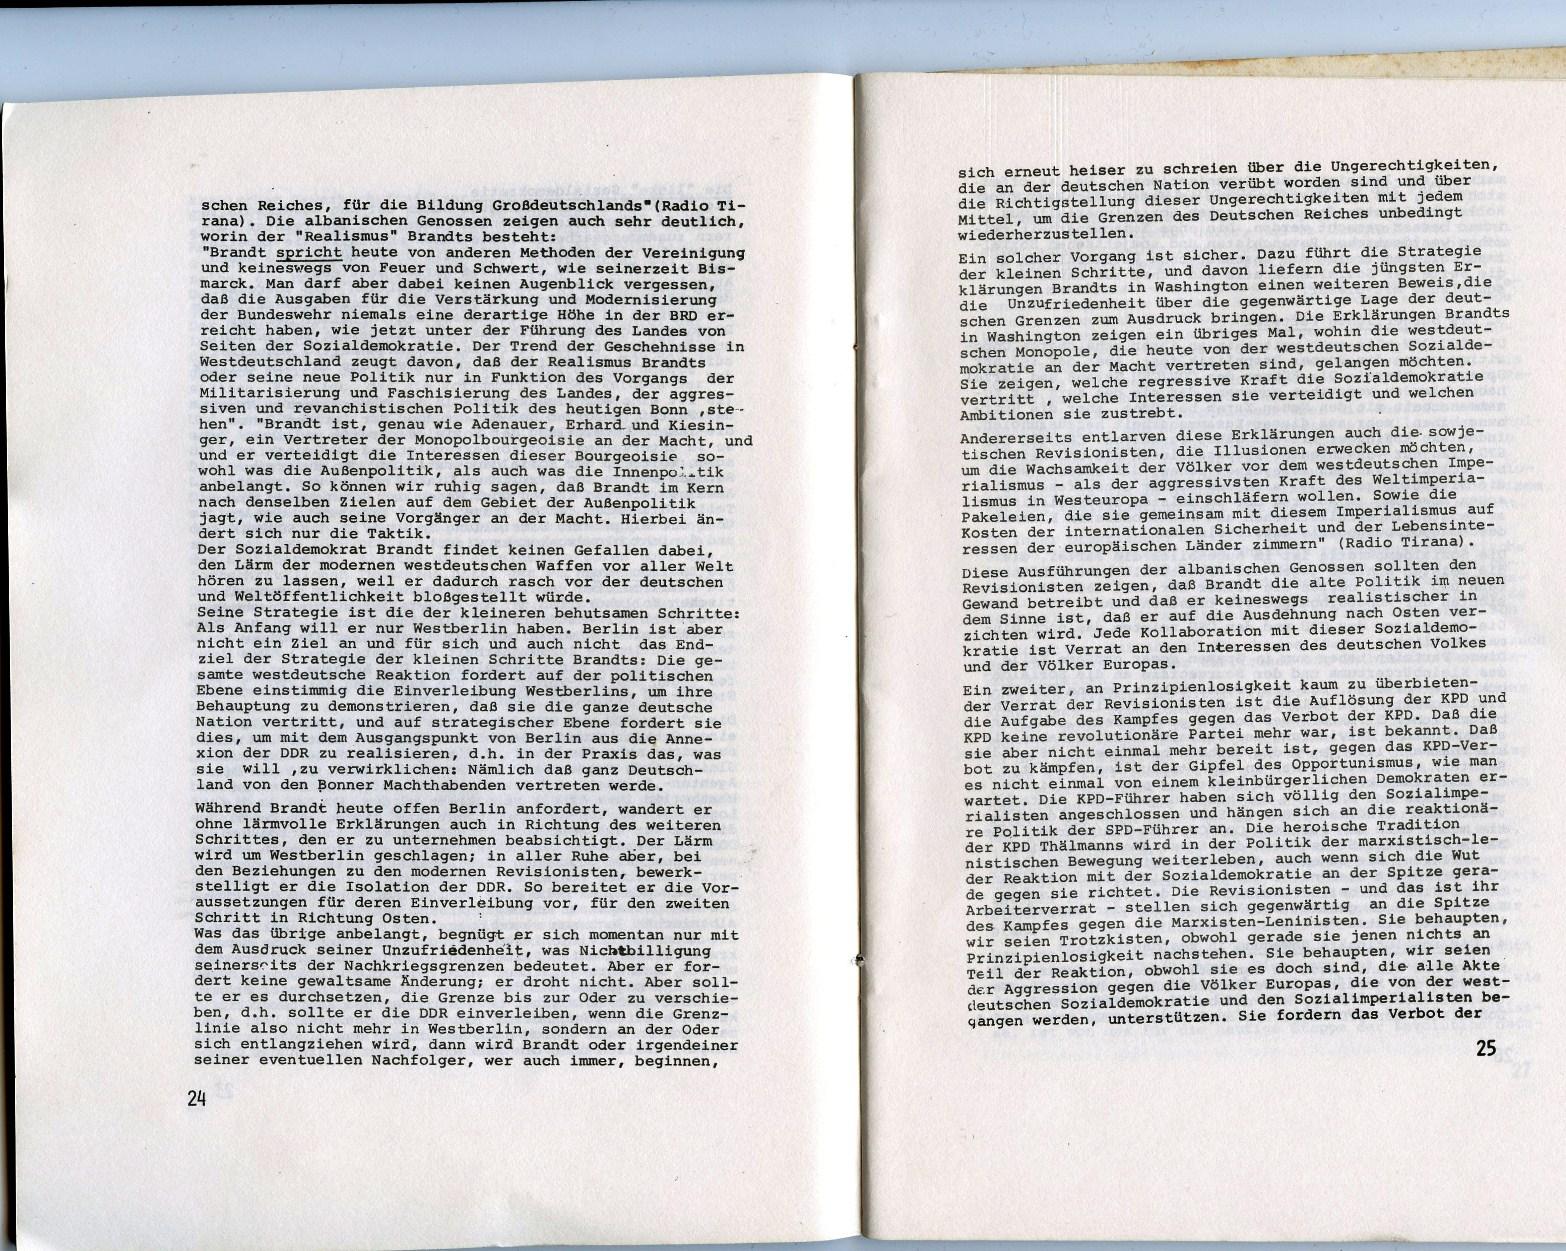 ZB_Parteiarbeiter_1971_09_13